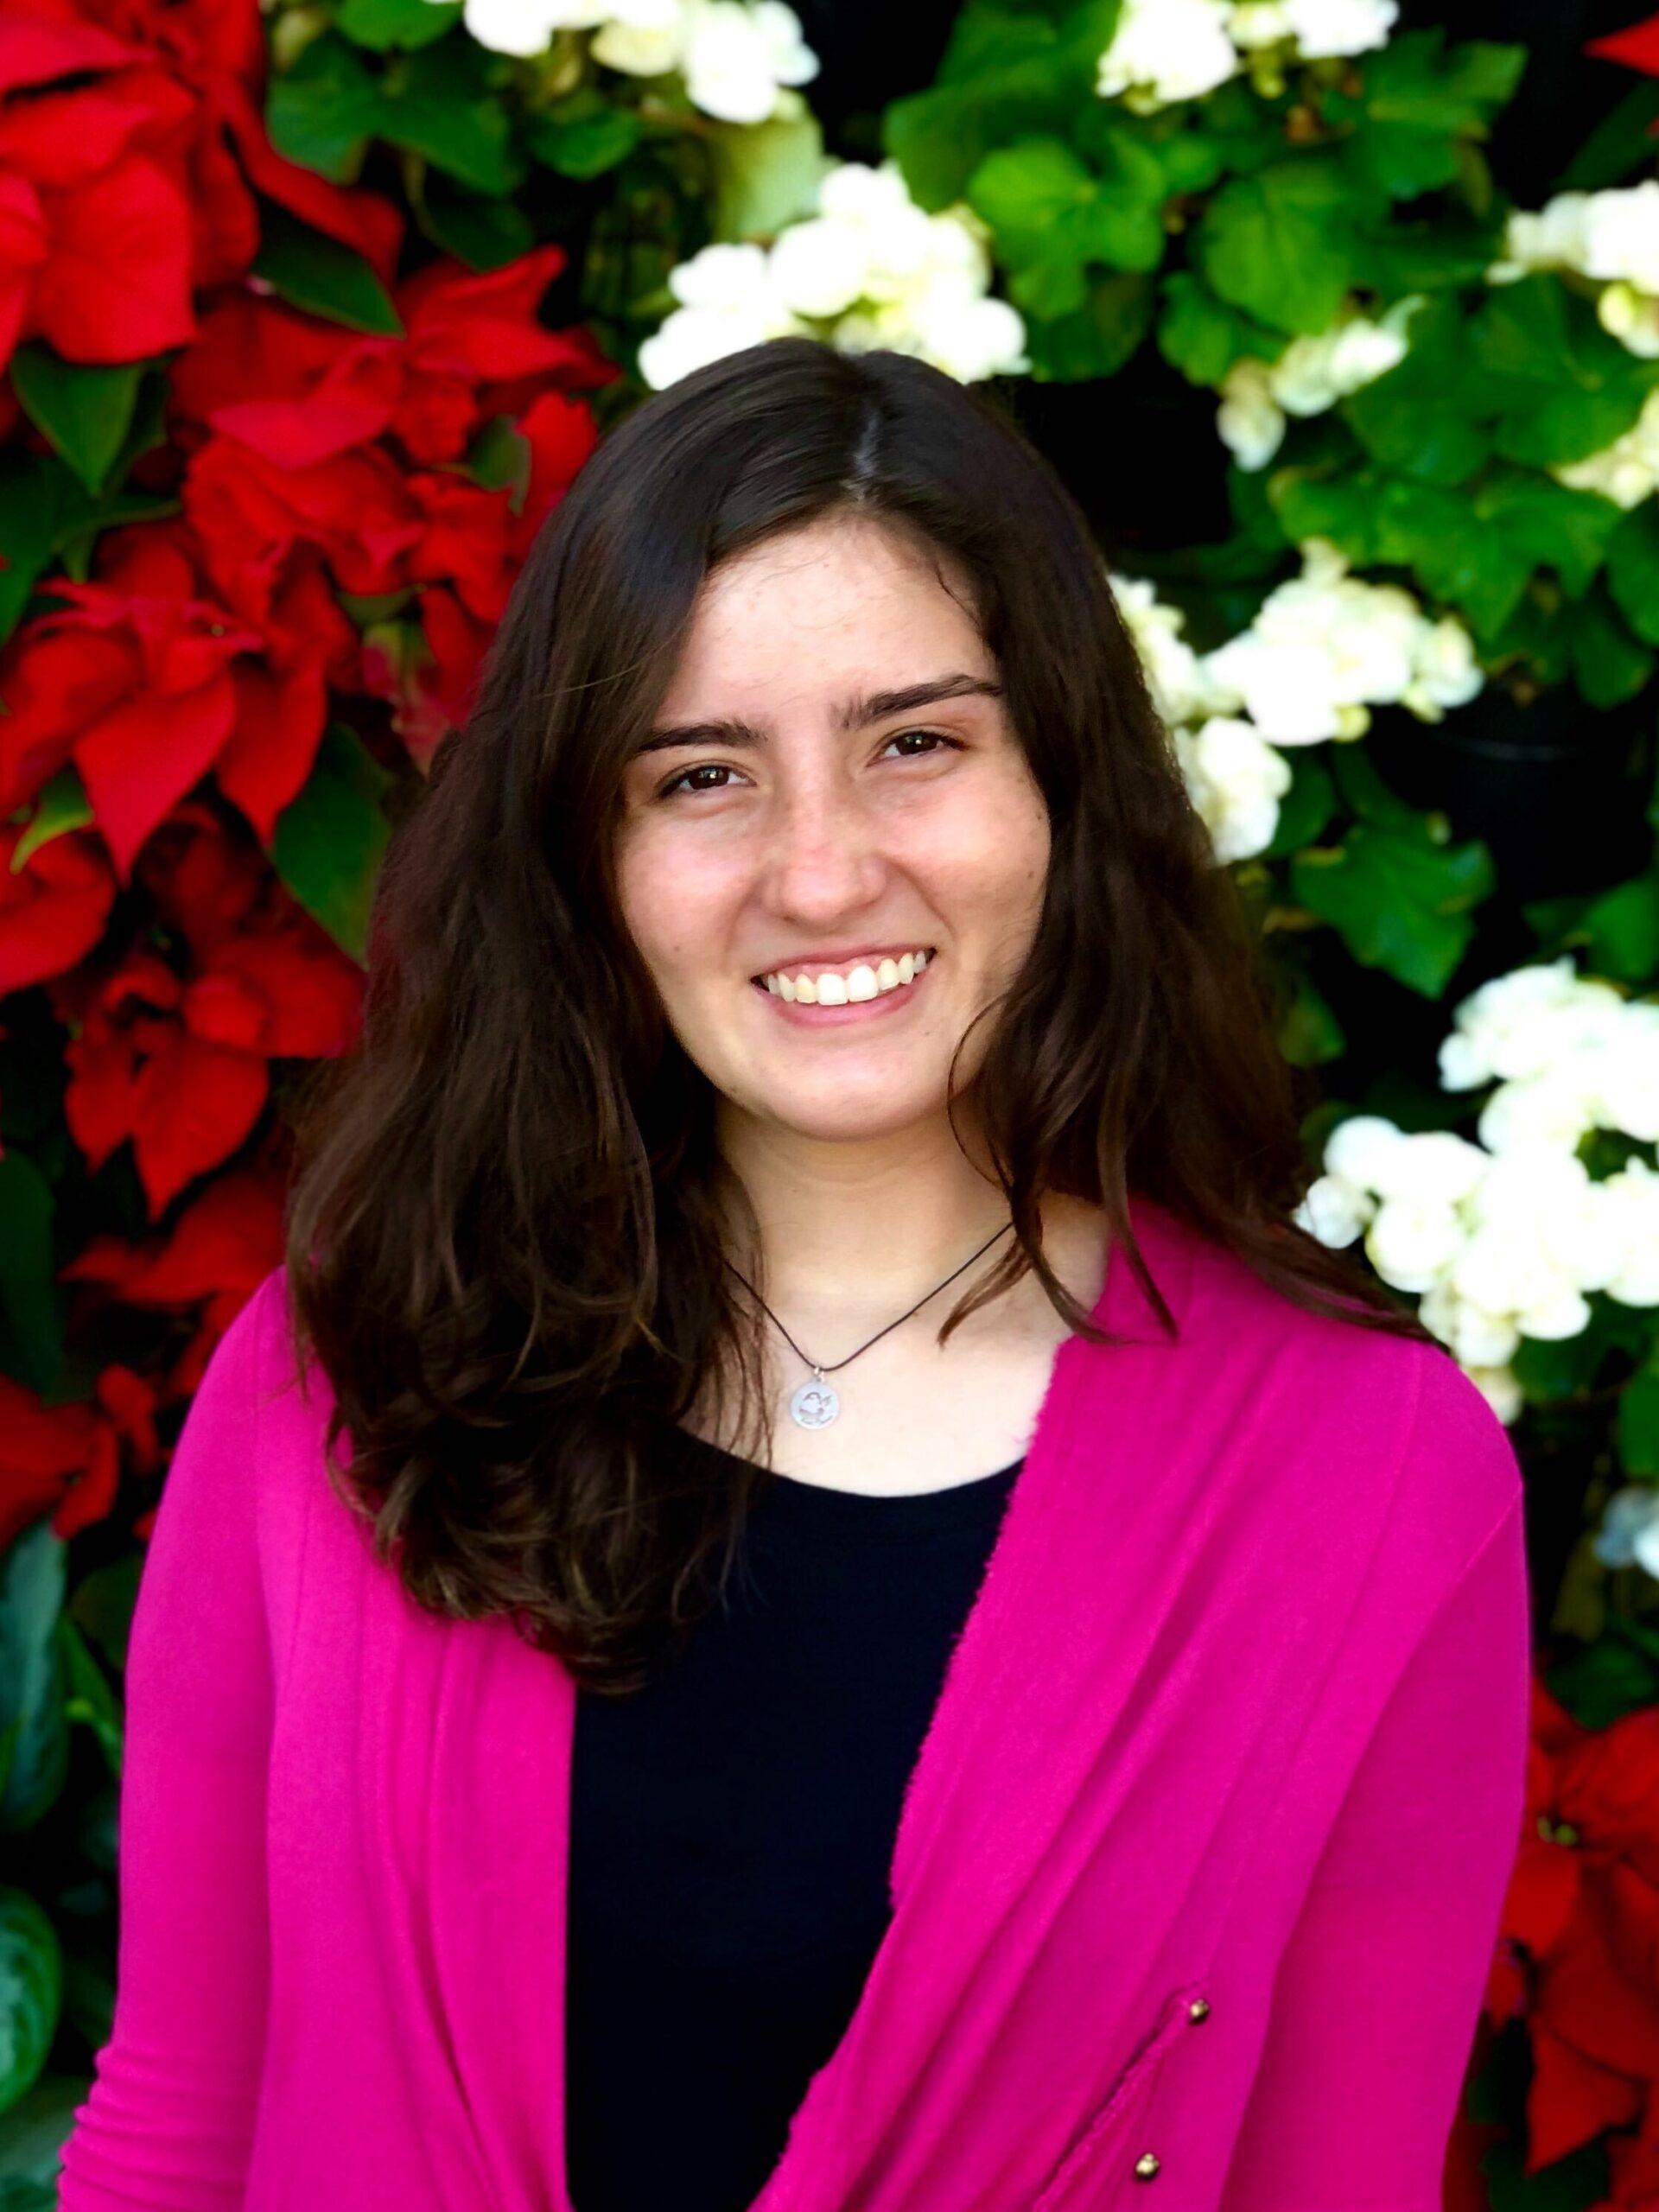 Katarine Emanuela Klitzke